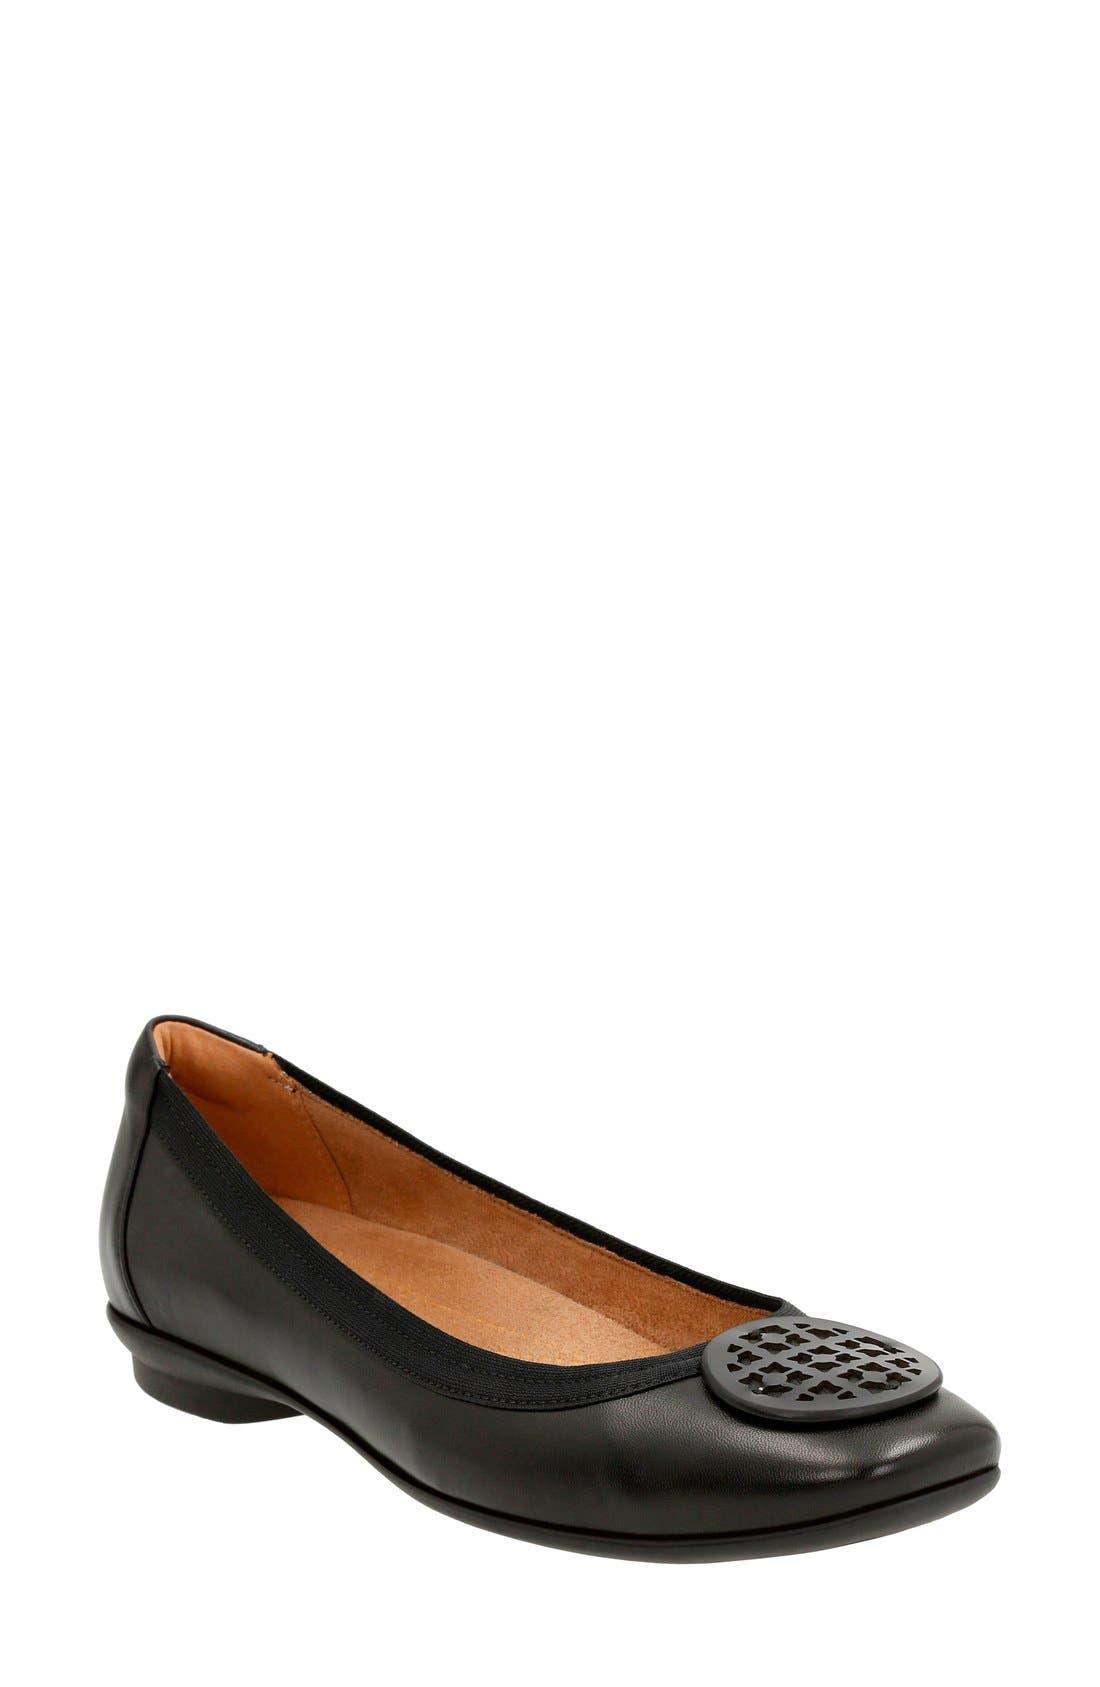 ... Black Leather. 'Candra Blush' Flat ...